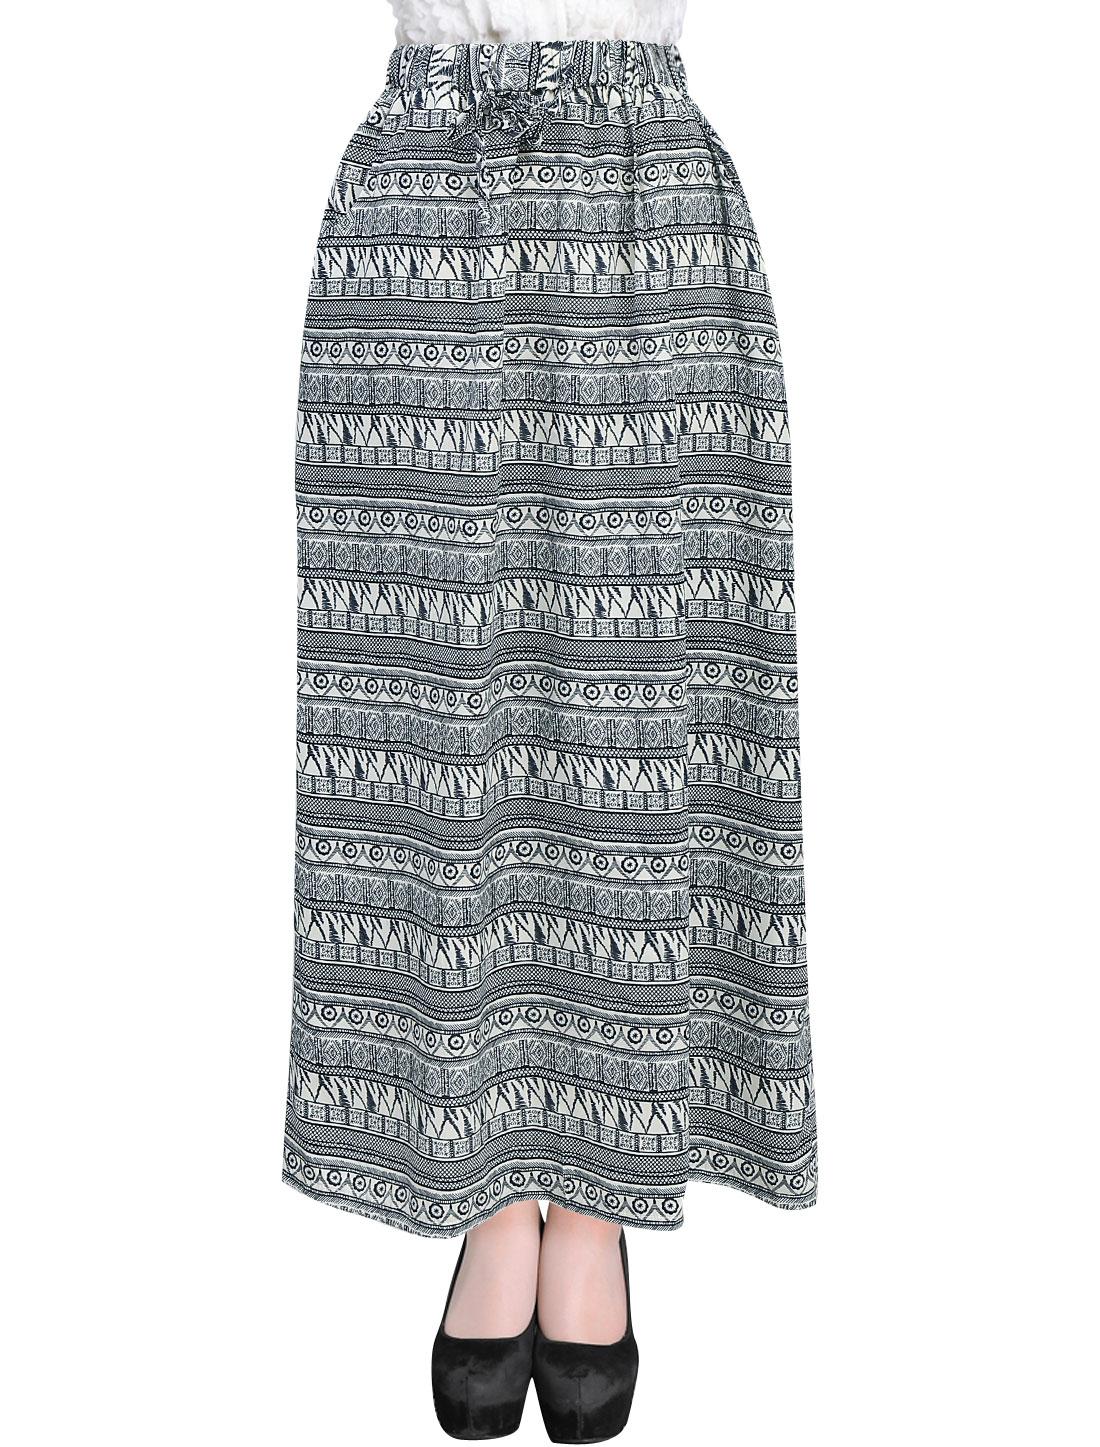 Ladies Drawstring Design Novelty Prints Ethnic Style Skirt Beige Navy Blue XS